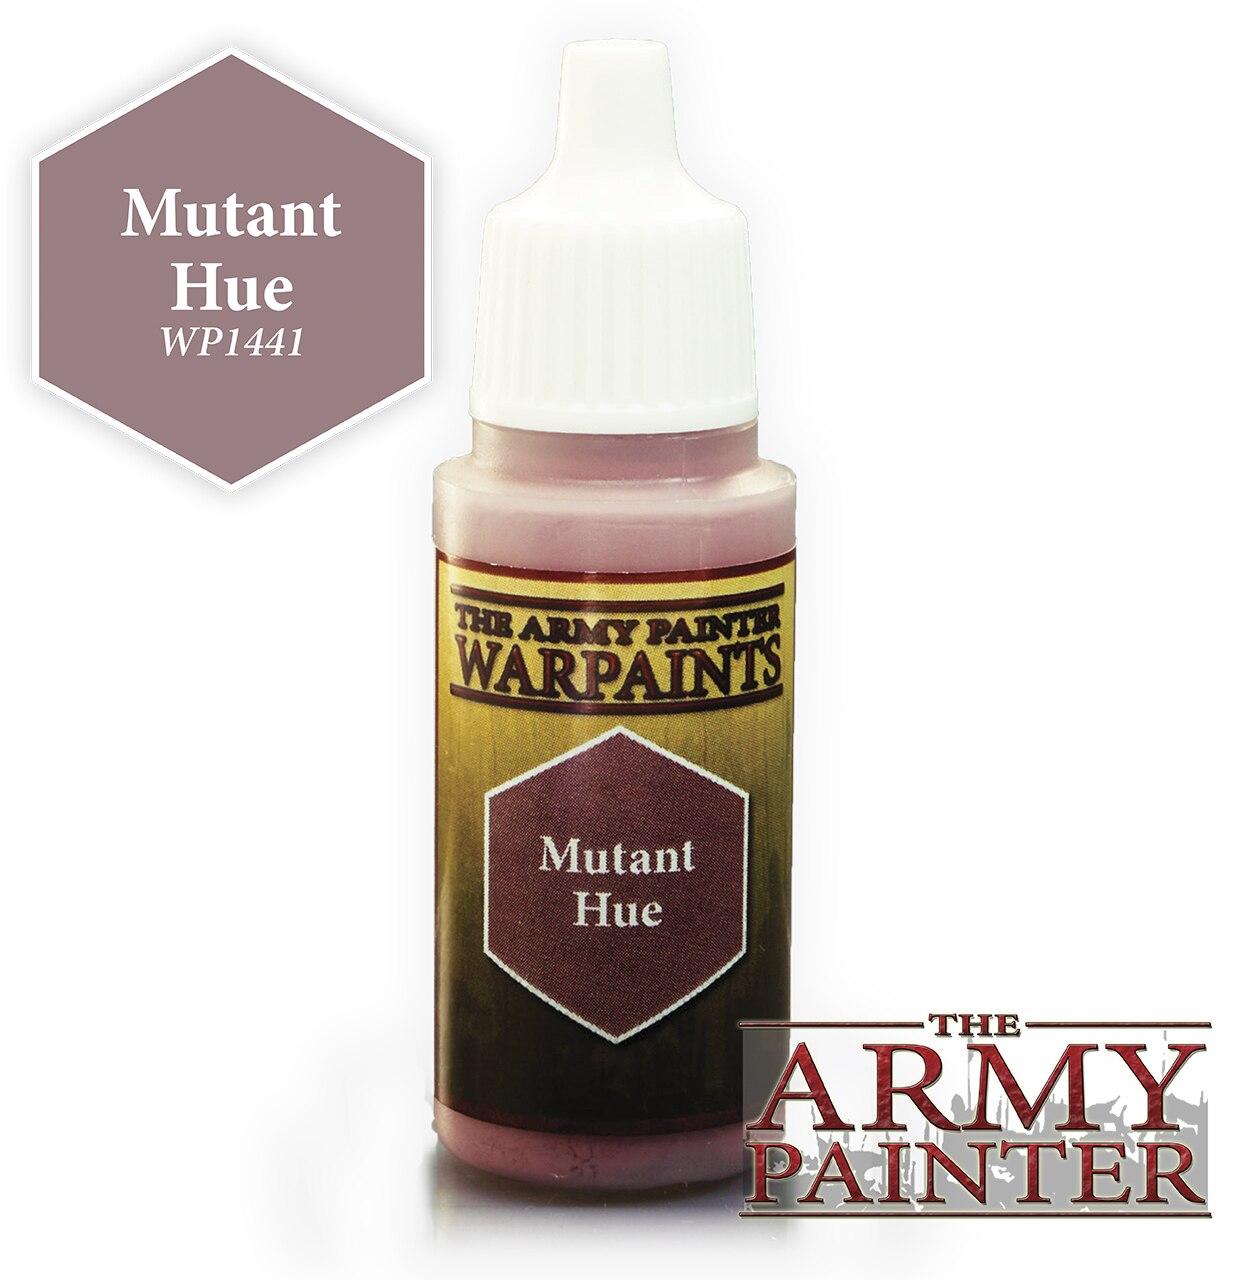 Army Painter Warpaint - Mutant Hue